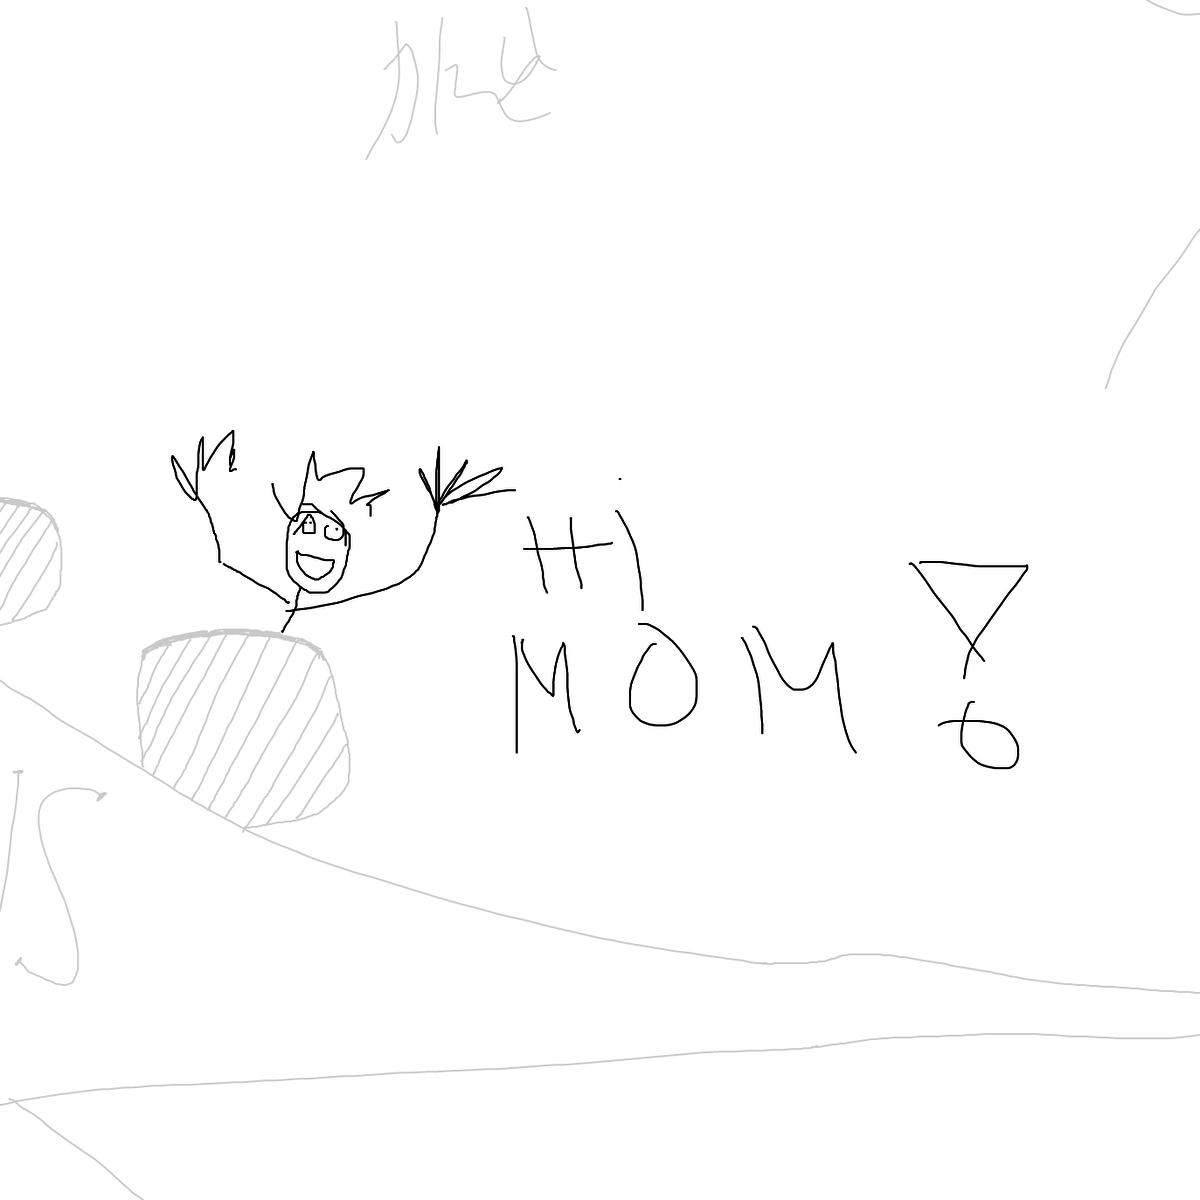 BAAAM drawing#11975 lat:52.4749908447265600lng: 13.4073610305786130